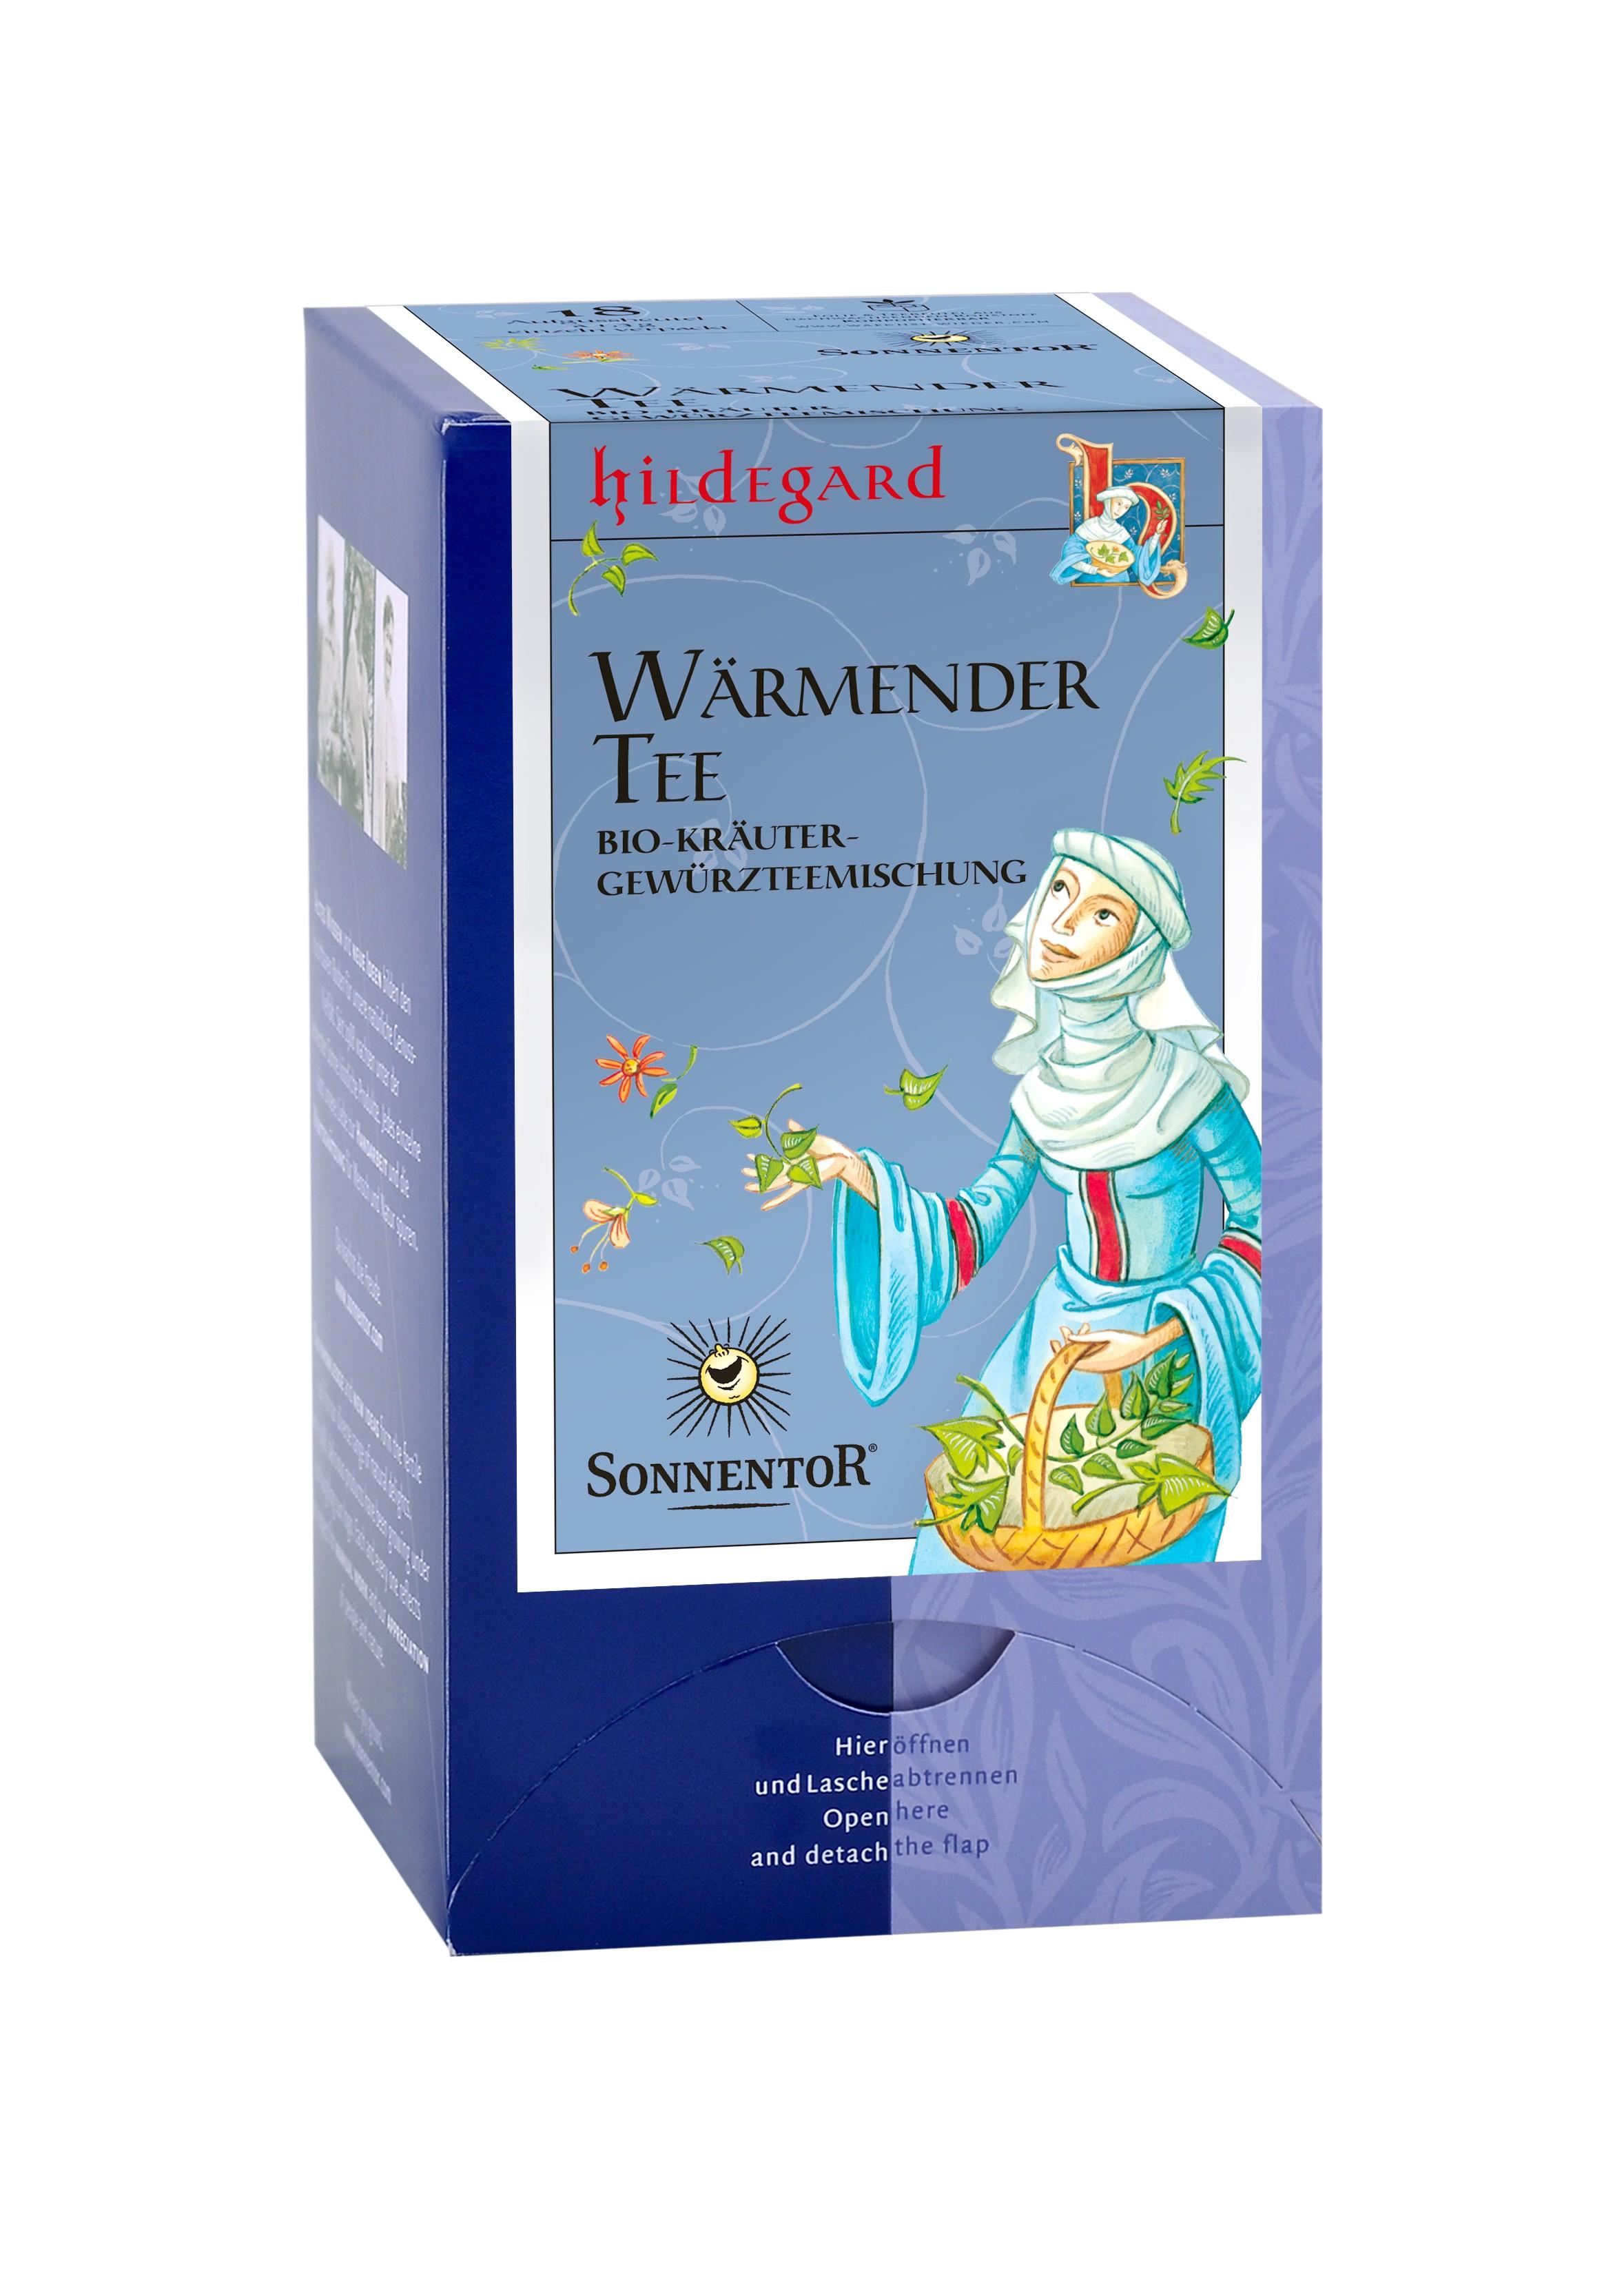 Wärmender Hildegard-Tee bio